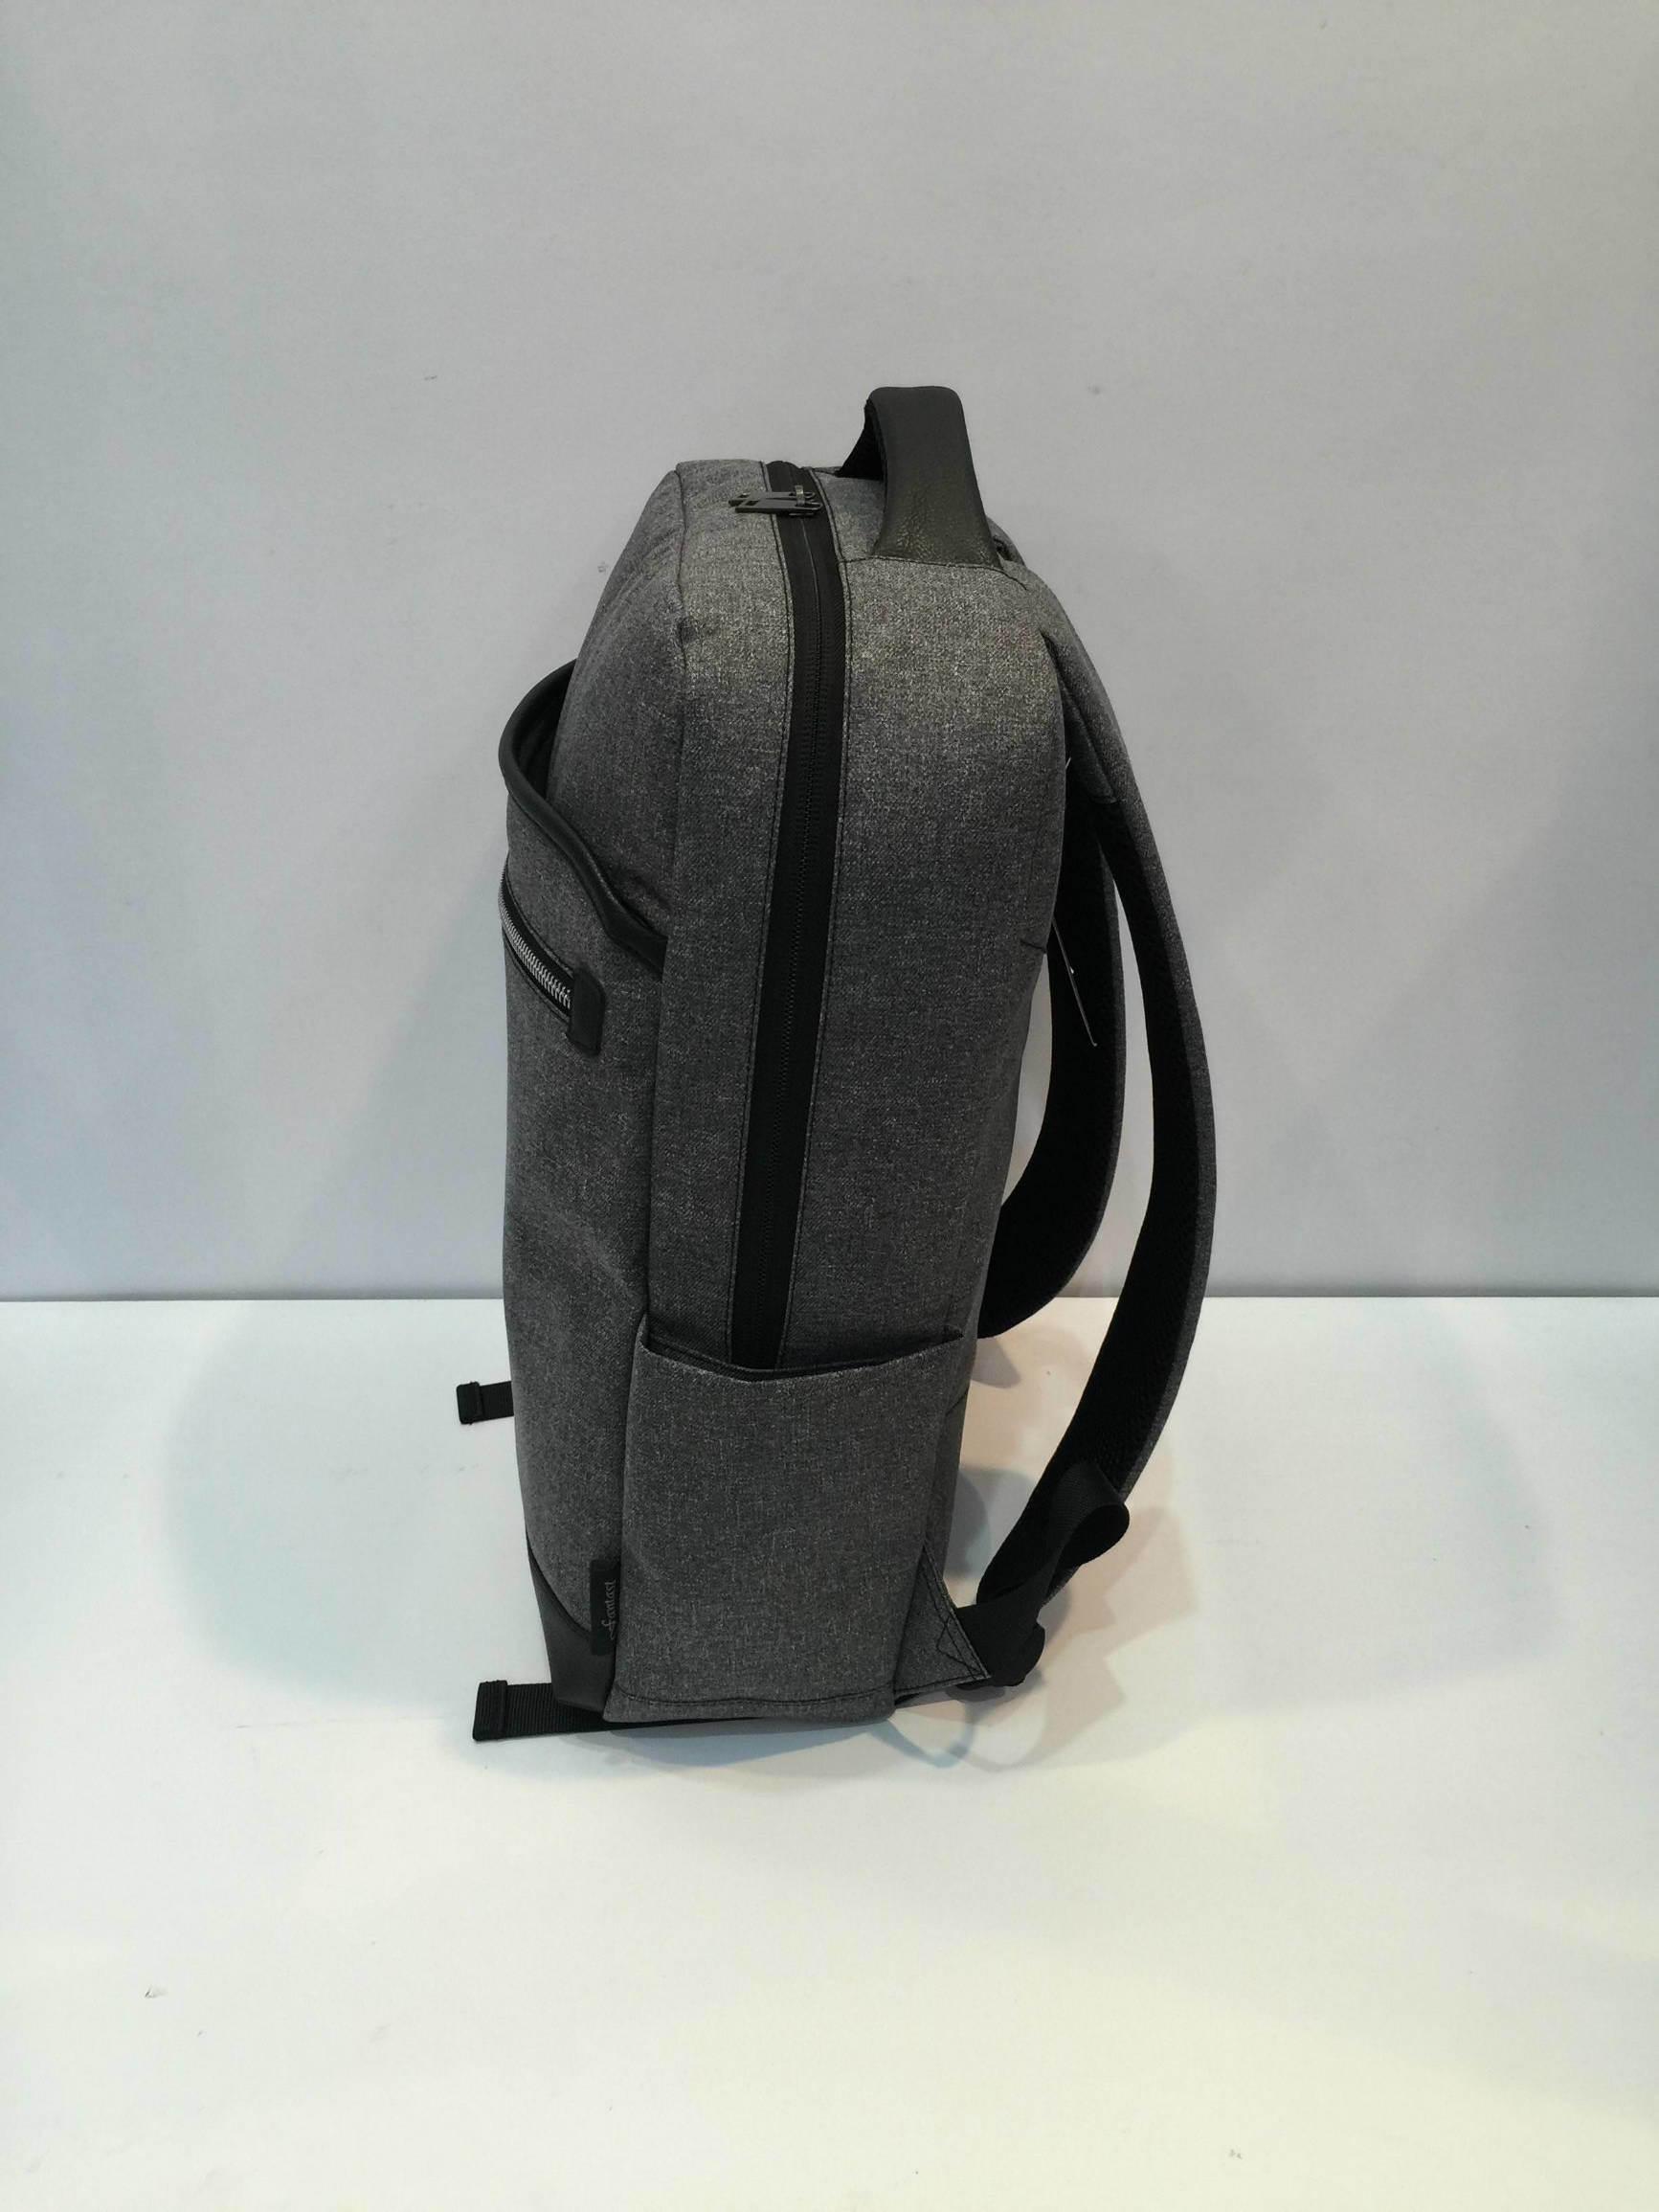 Snowflake Cloth Laptop Shouder Bag for Work/School/Travling